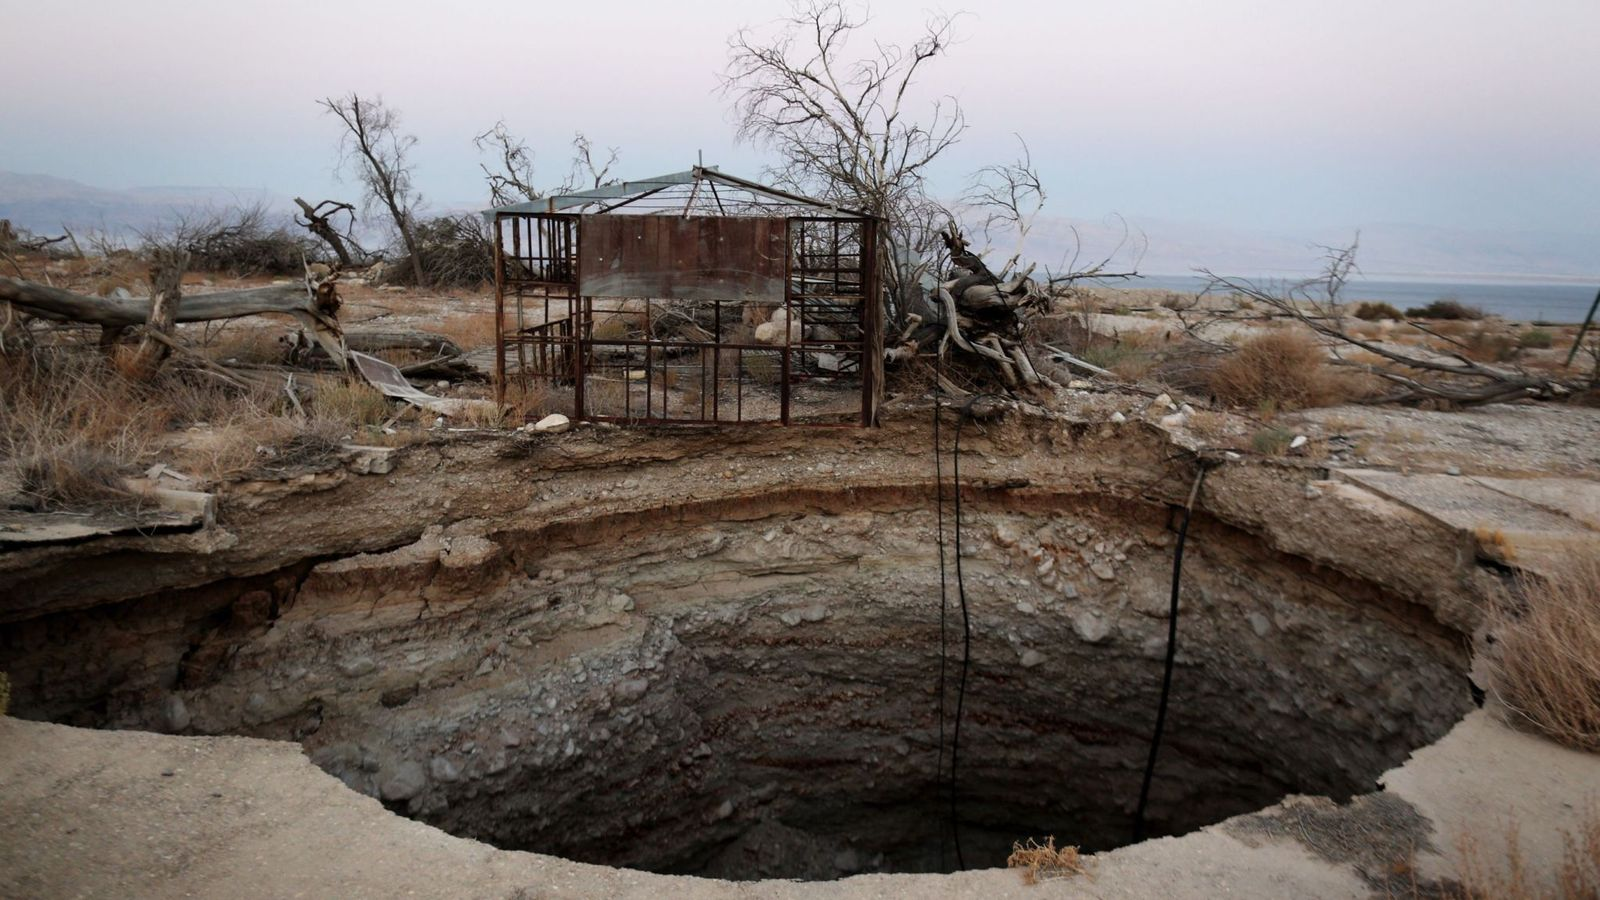 Dead Sea: Biblical wonder is facing 'environmental disaster in slow motion'